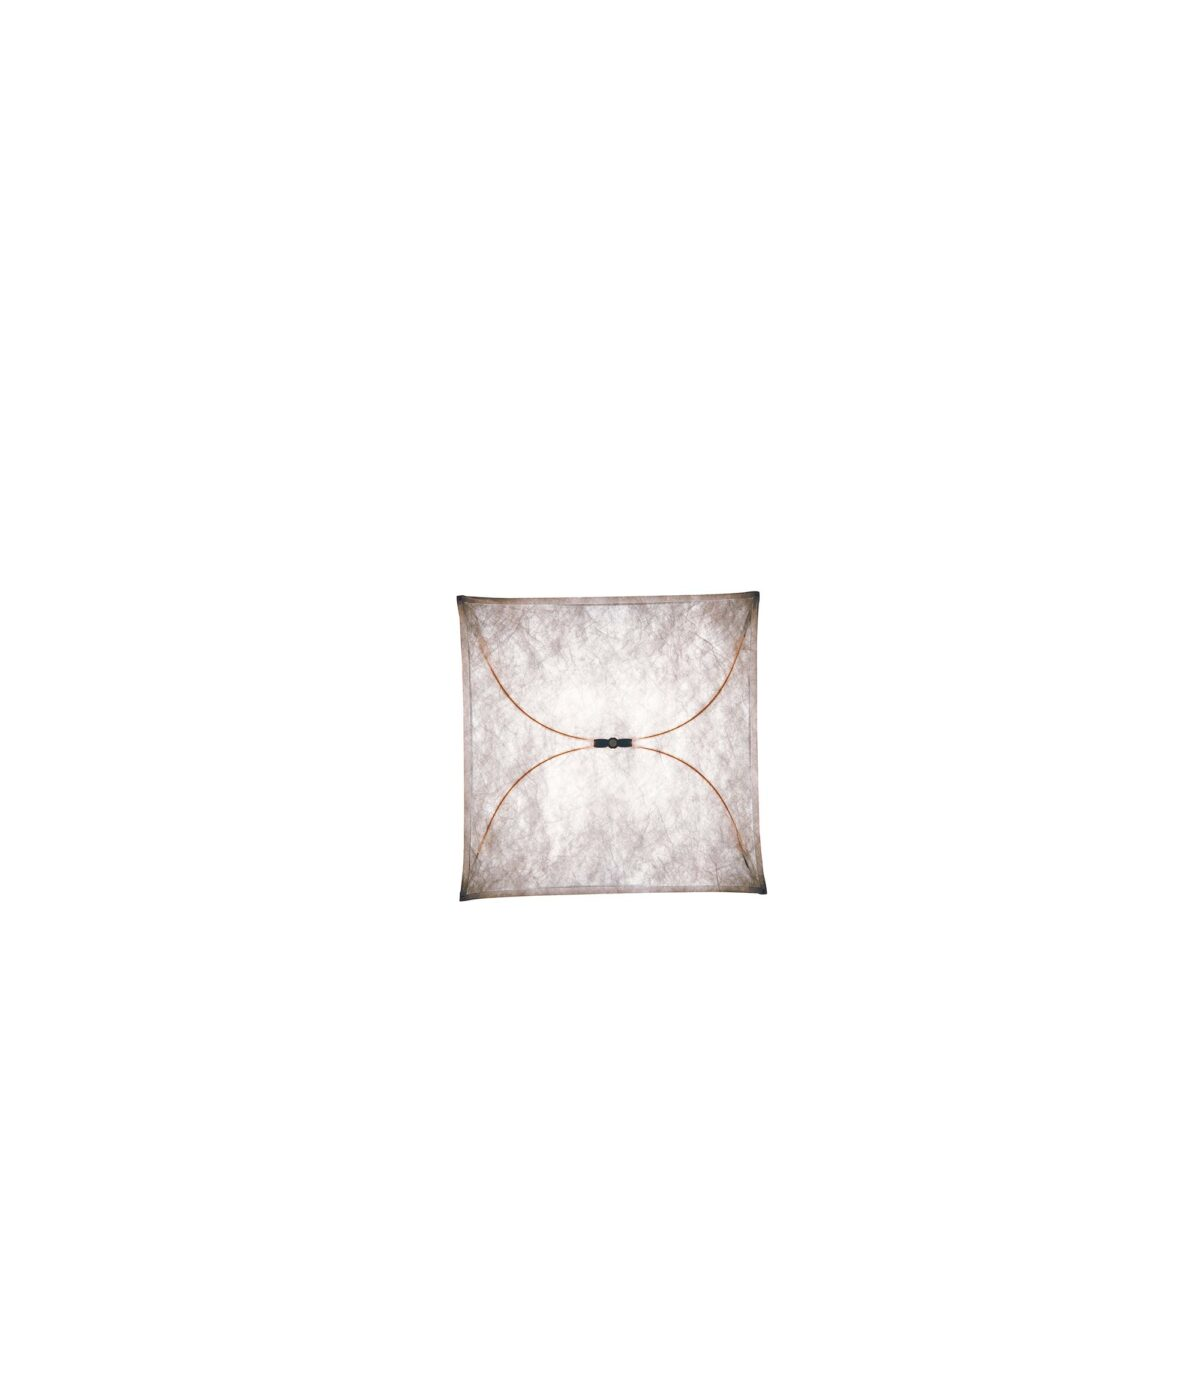 ariette 1 ceiling wall scarpa flos F04000 product still life big 1